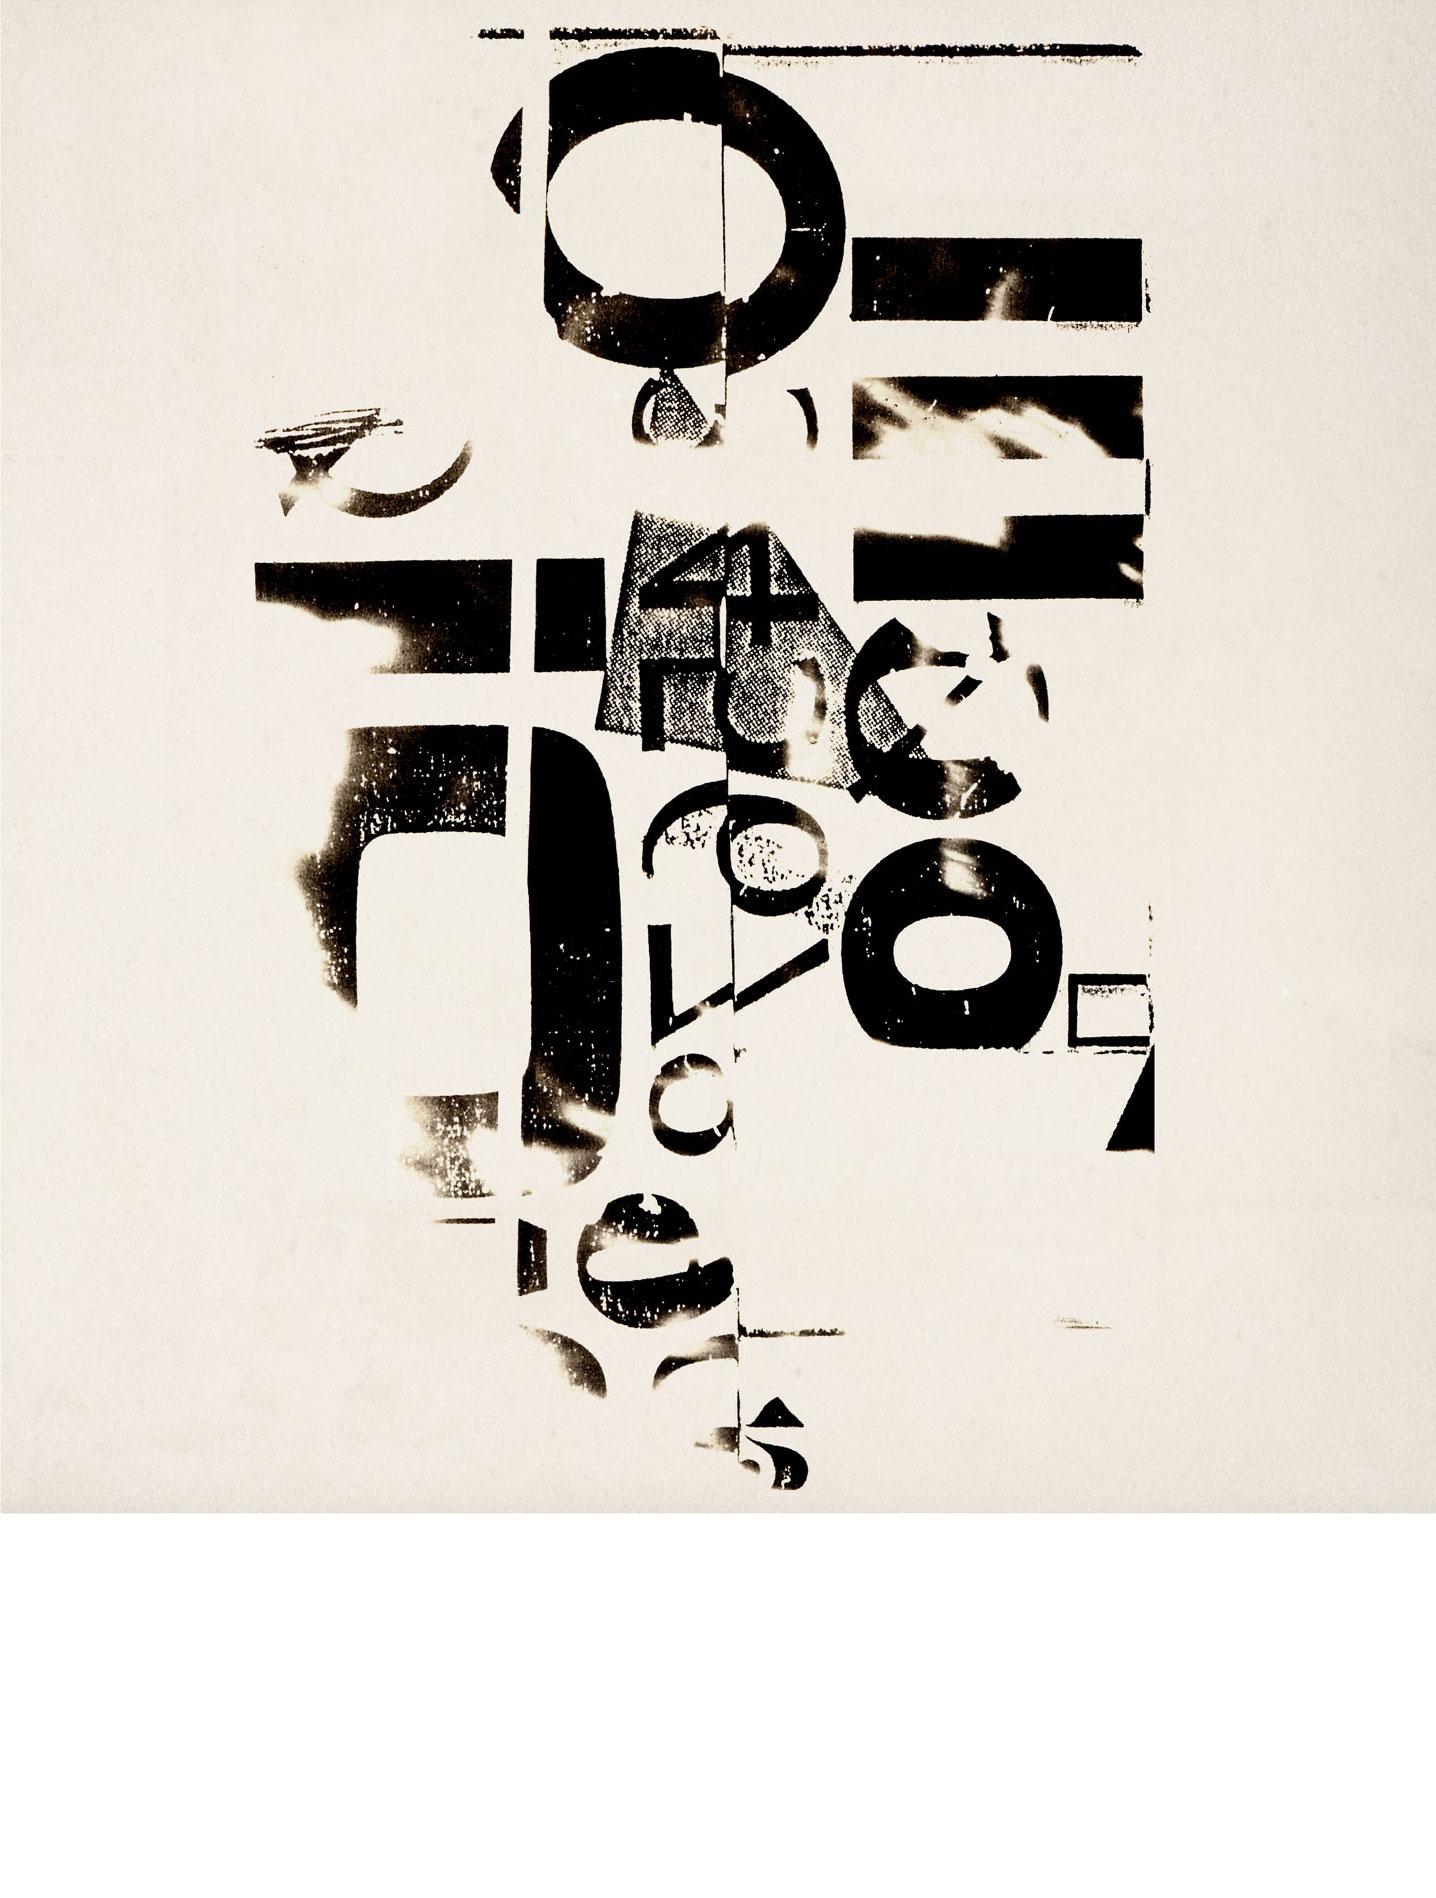 'Turning Points' Typographic Photogram